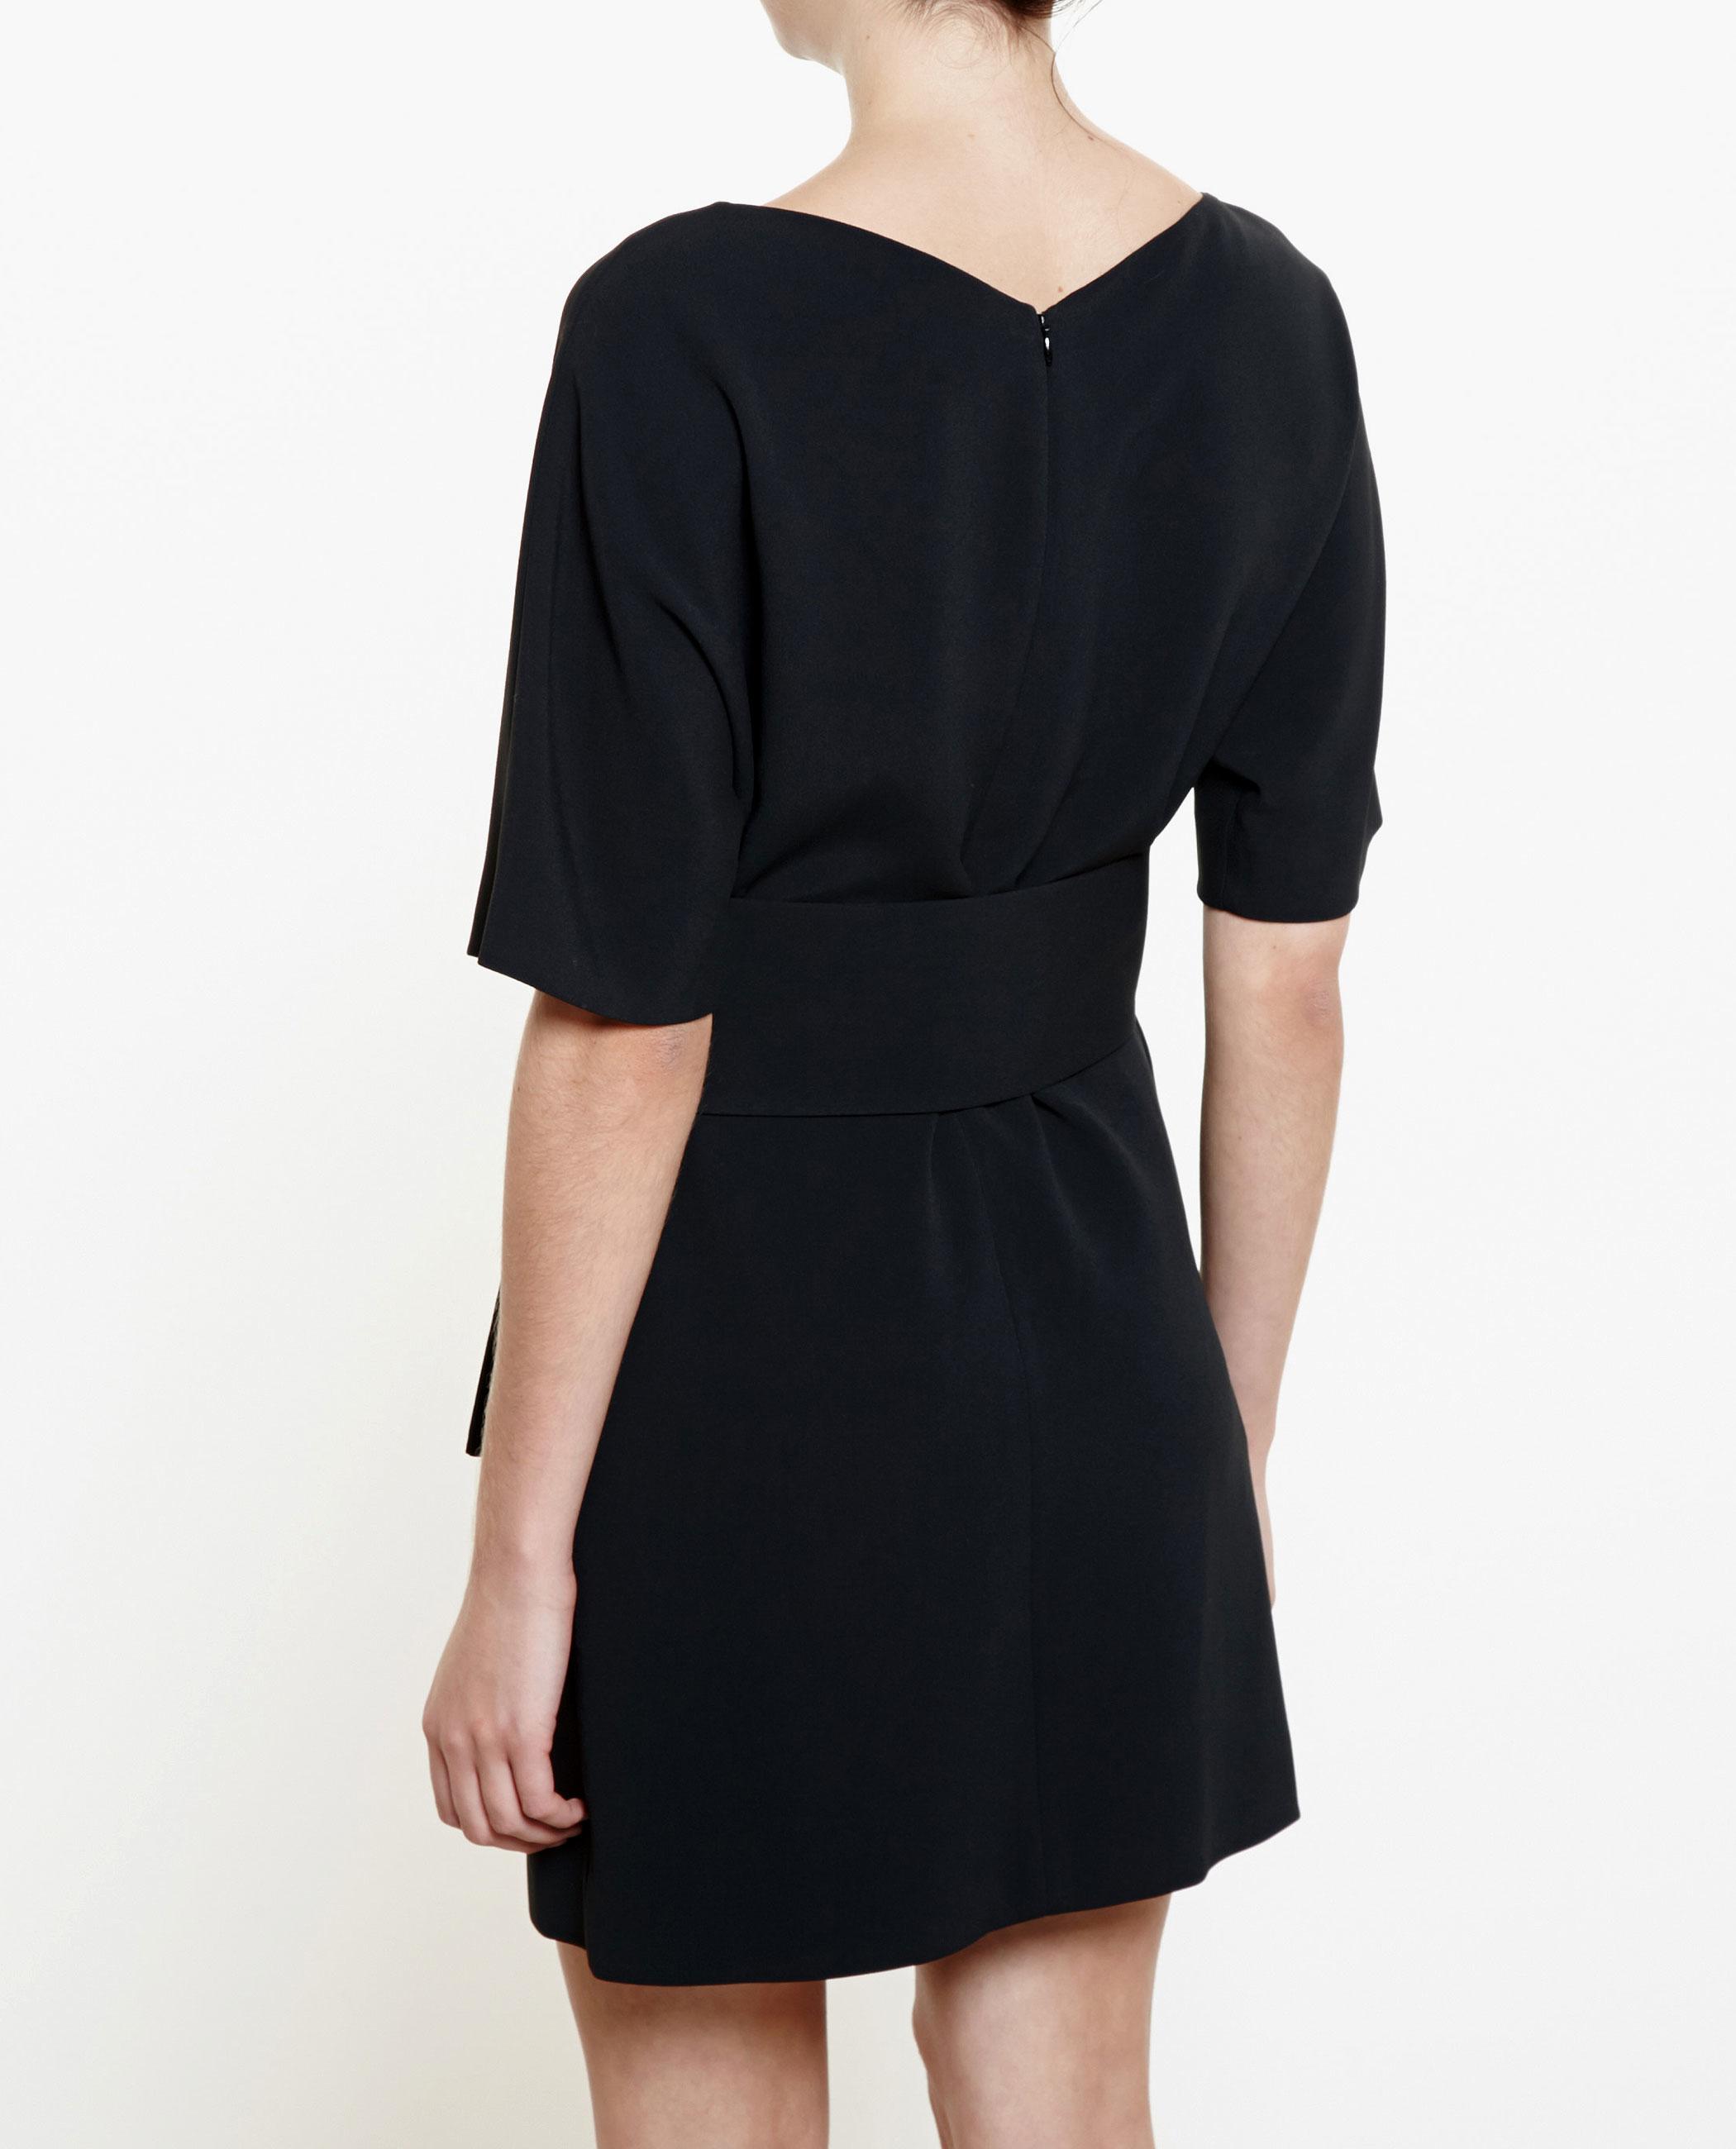 Jacqueline Tiered Tulle-Hem Dress Osman wj3dYv3